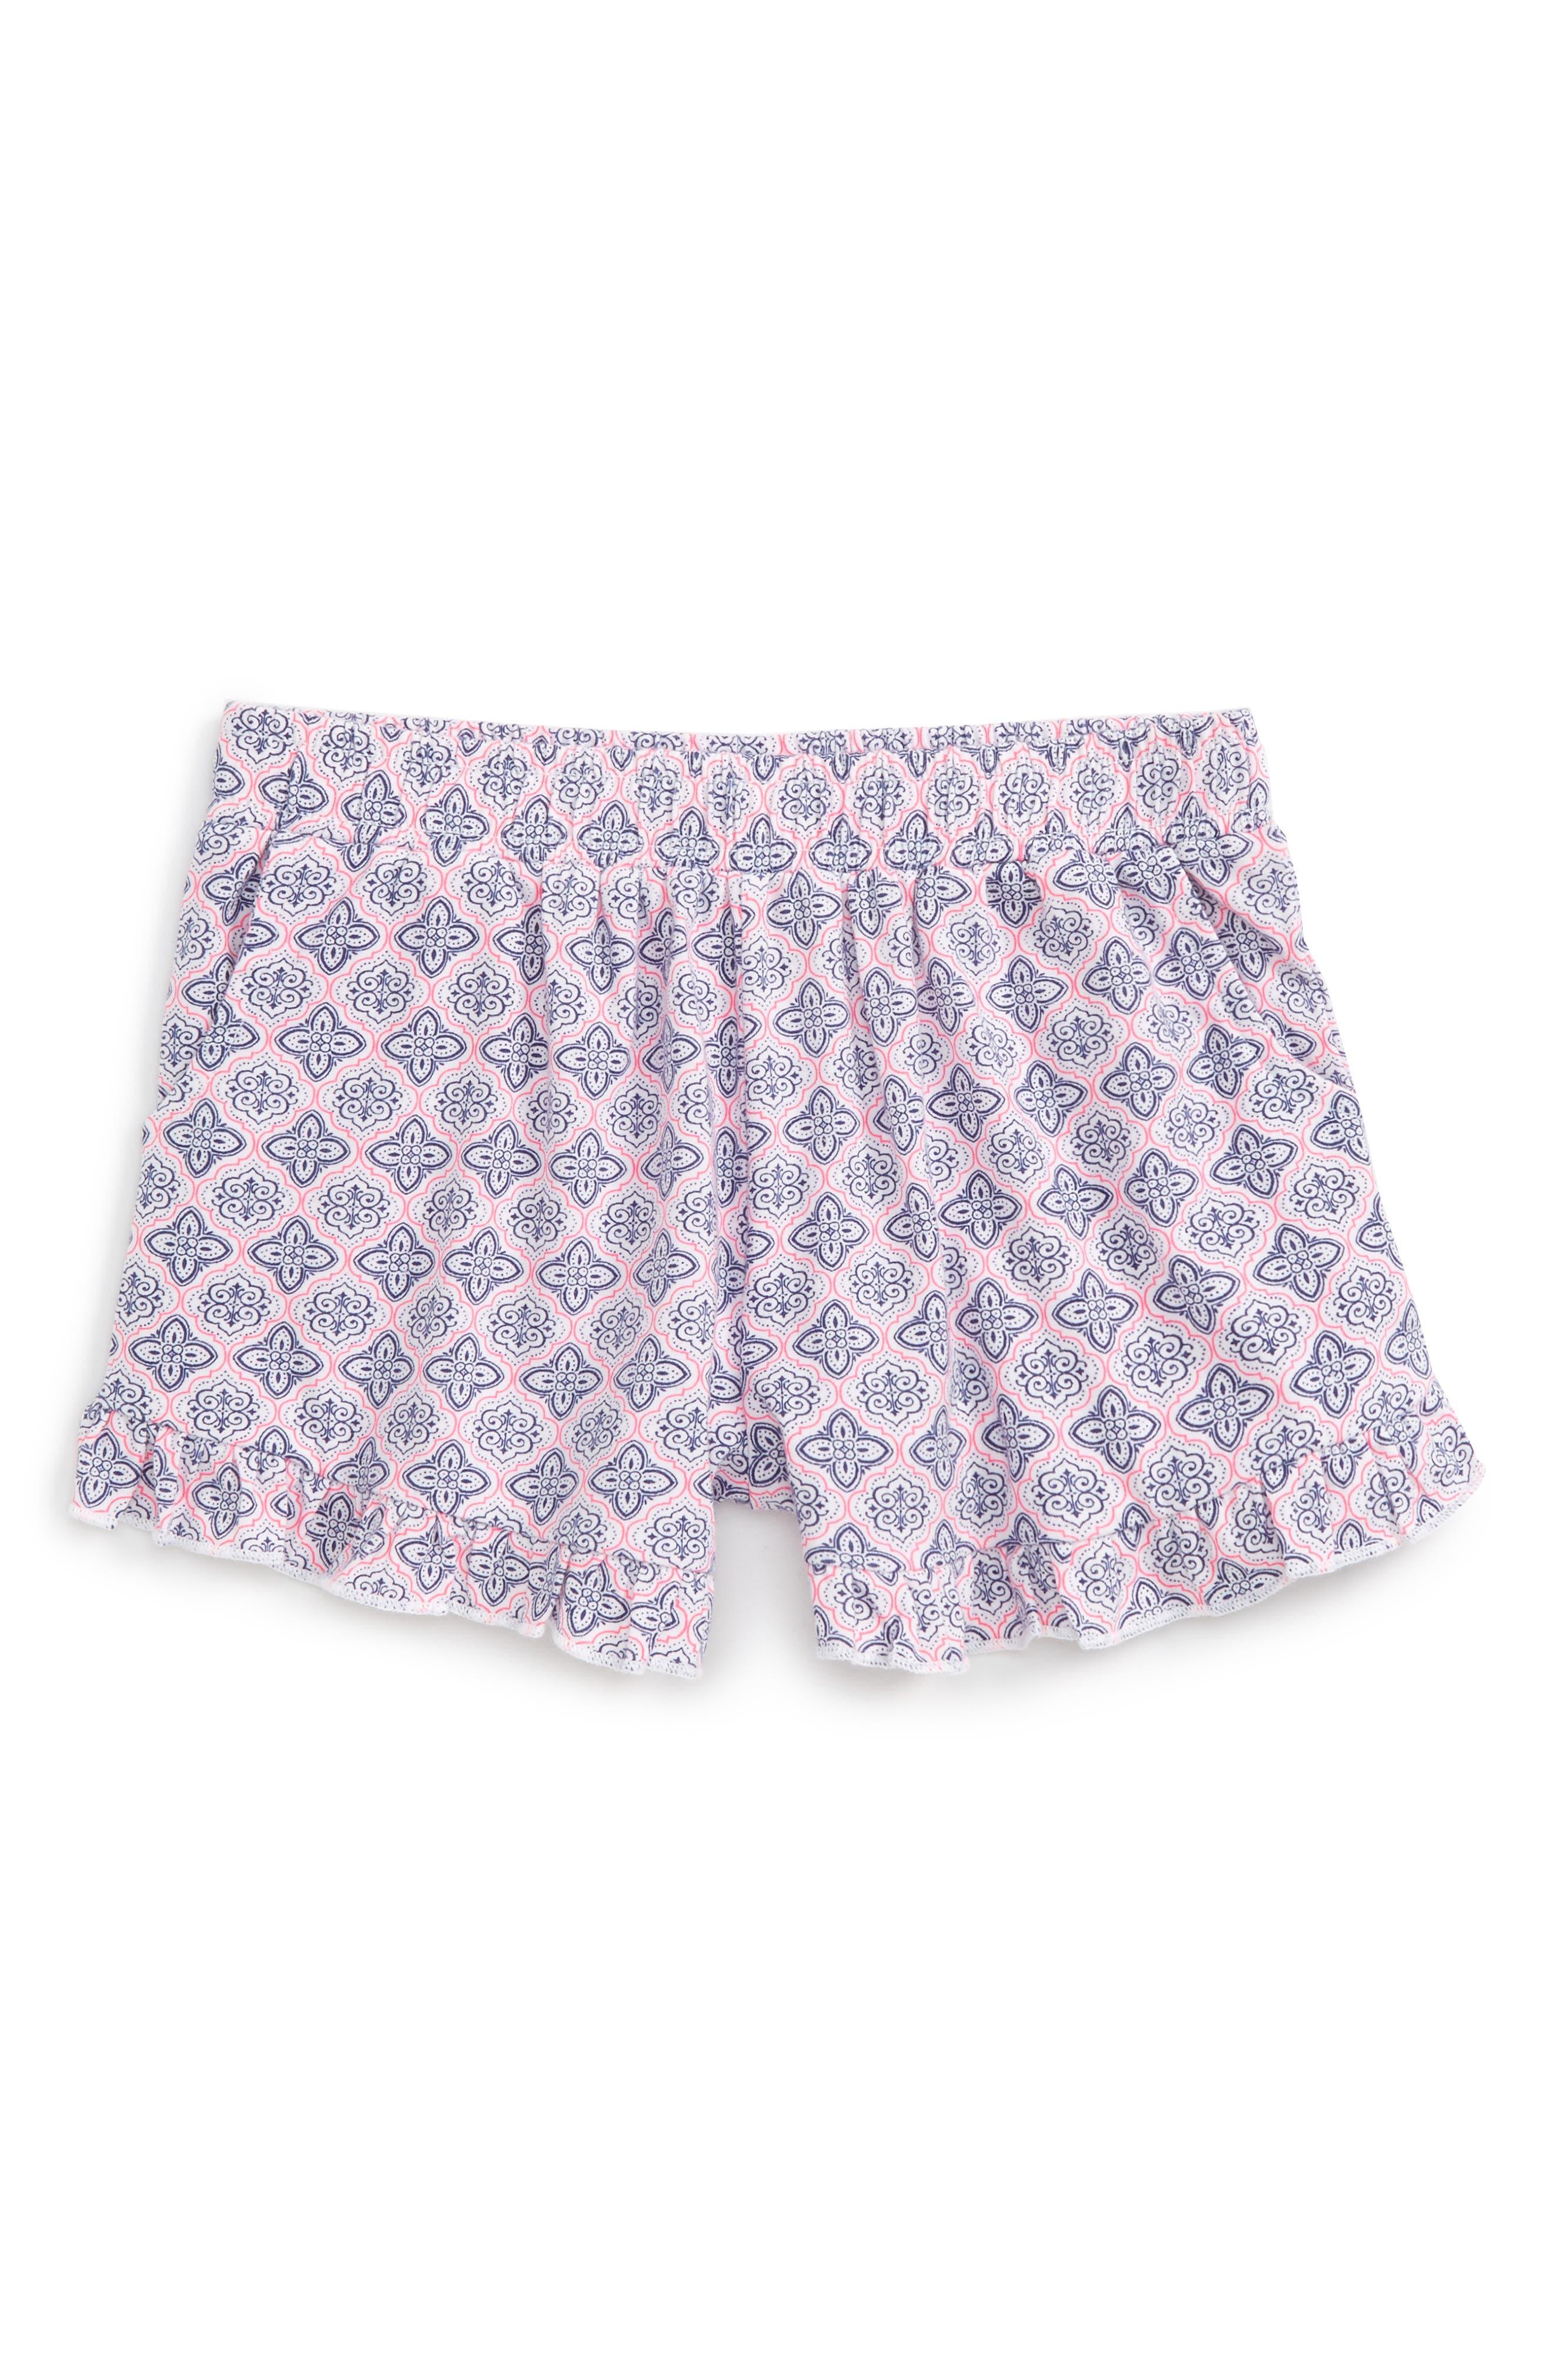 Alternate Image 1 Selected - Tucker + Tate Print Ruffle Shorts (Toddler Girls, Little Girls & Big Girls)